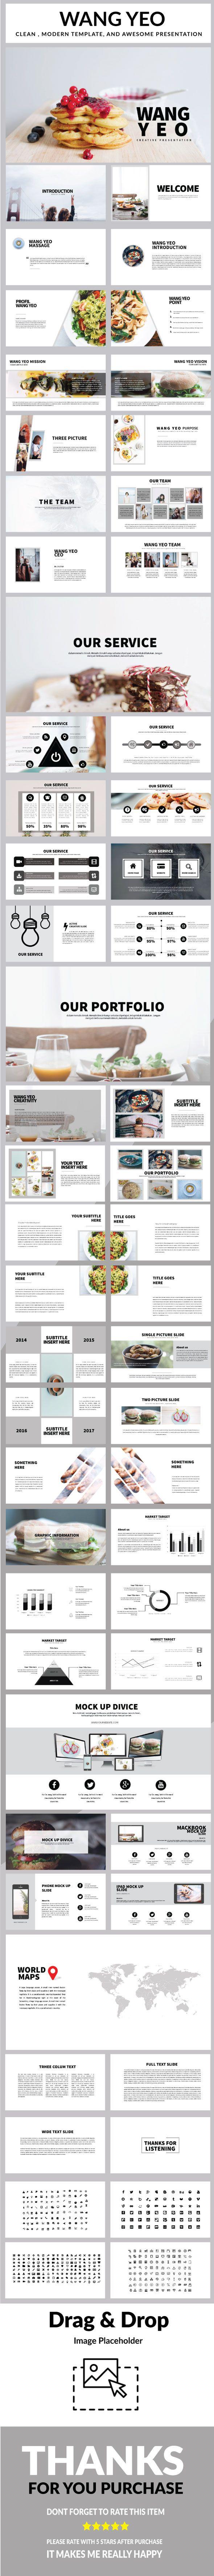 wang yeo multipurpose powerpoint | presentation templates, Powerpoint templates